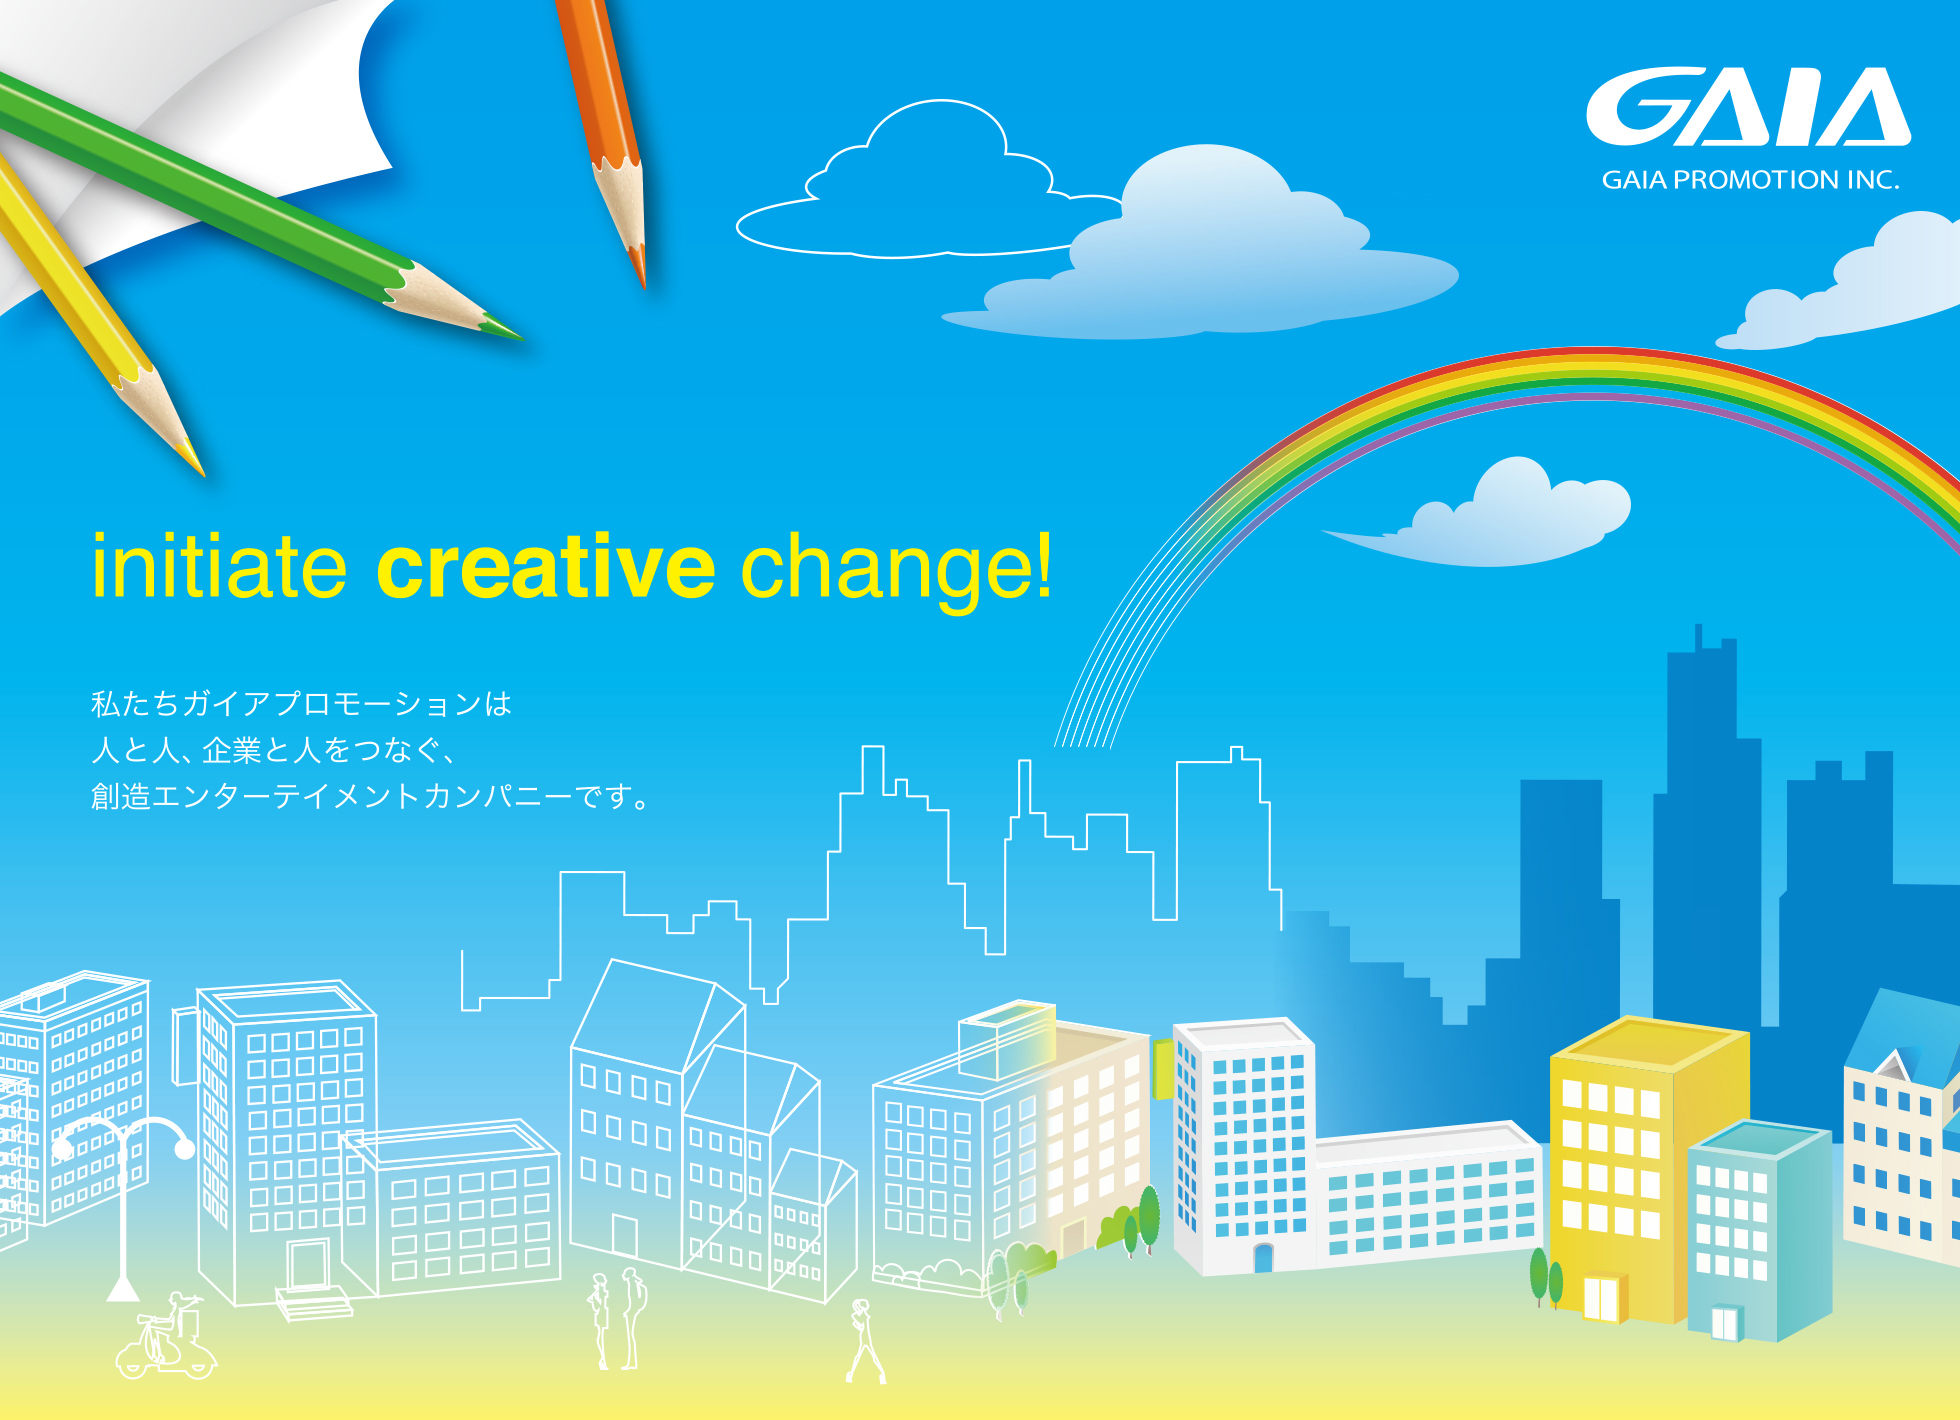 GAIA PROMOTION INC. initiate creative change! 私たちガイアプロモーションは人と人、企業と人をつなぐ、創造エンターテイメントカンパニーです。